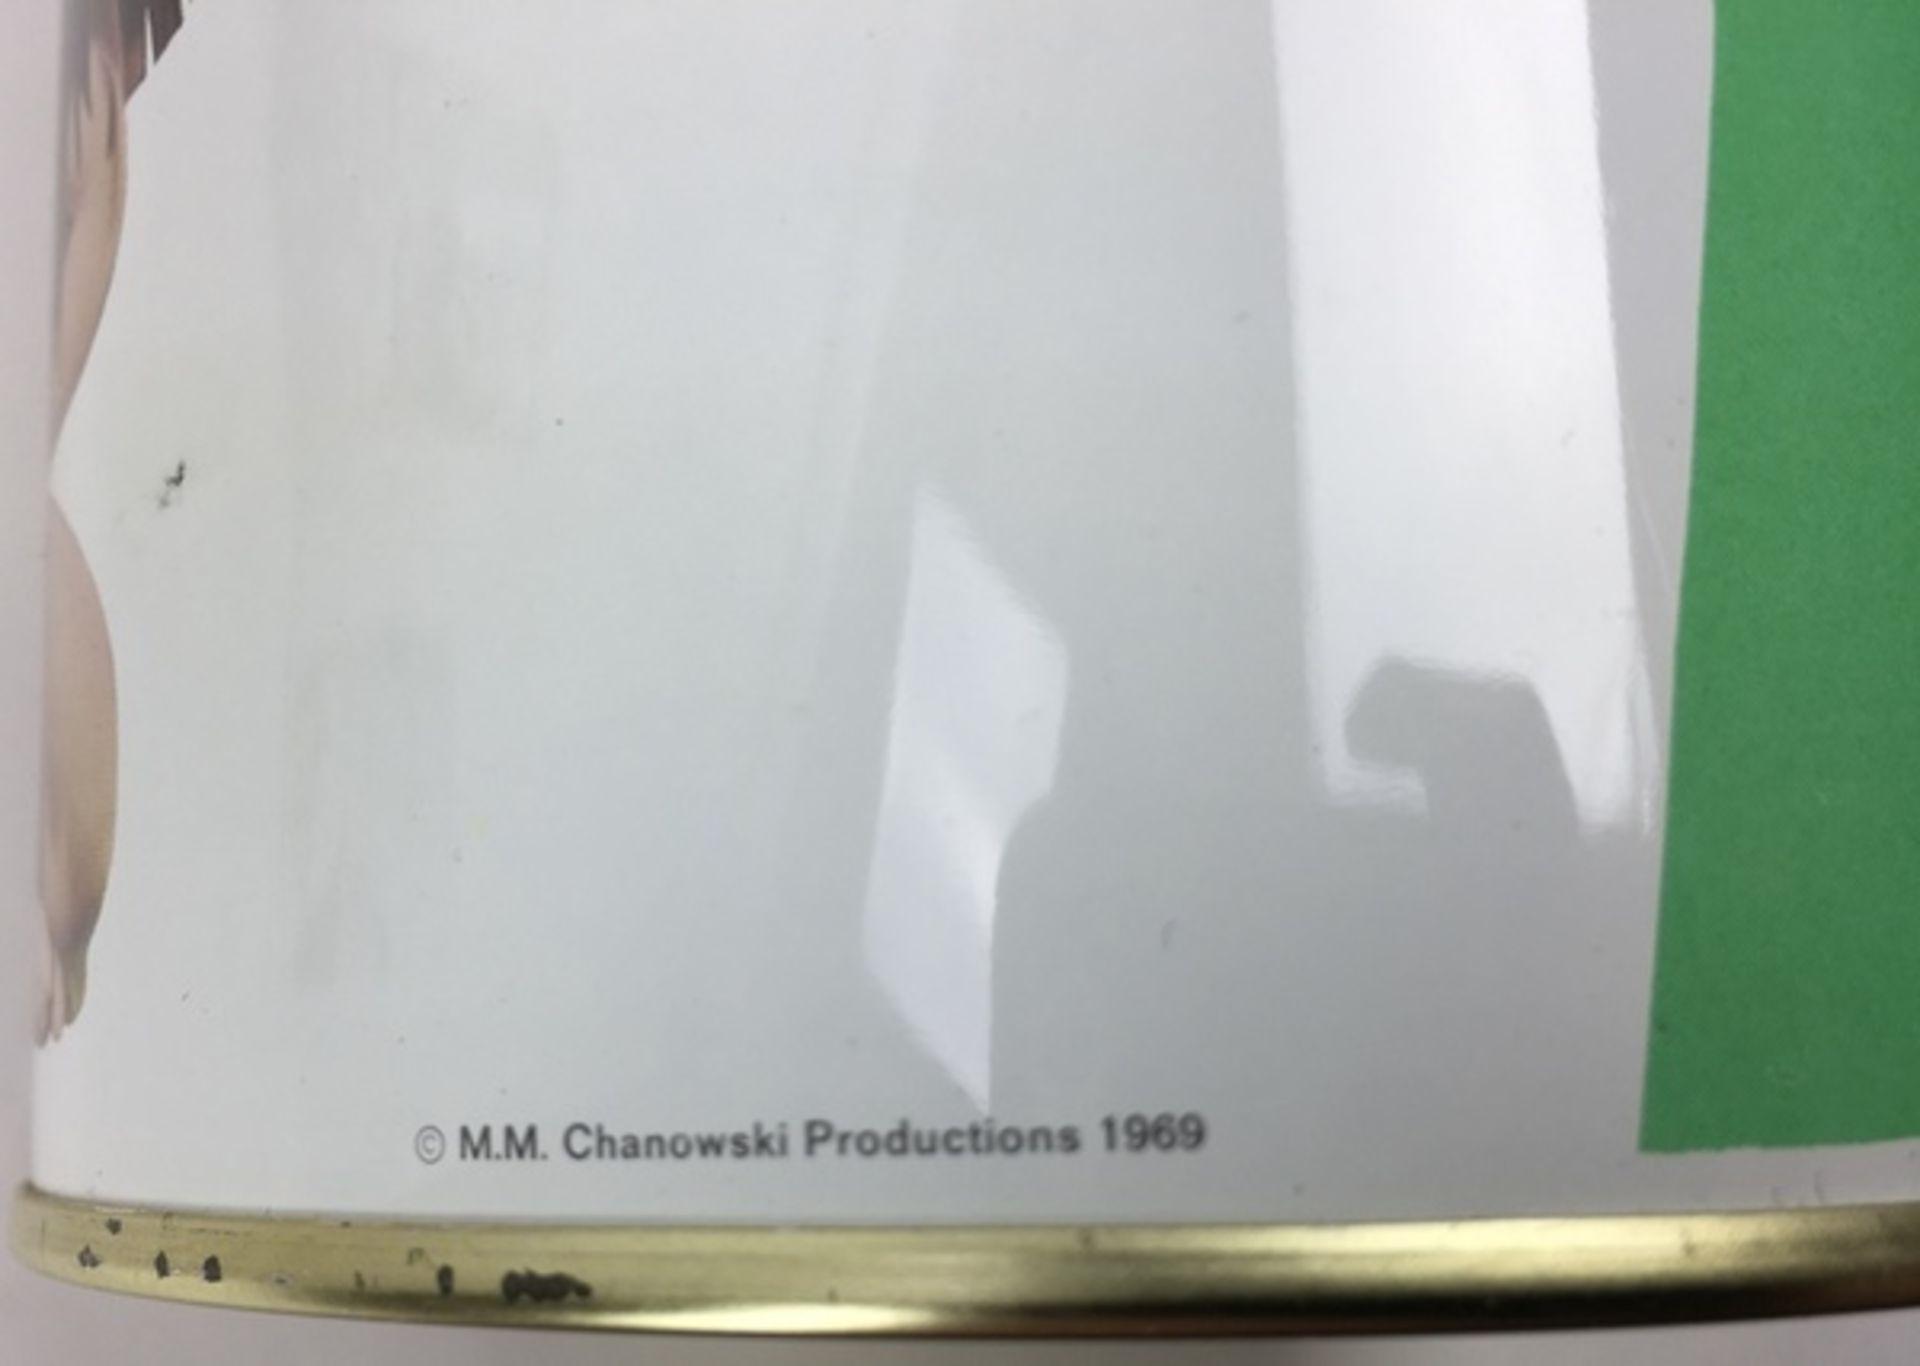 (Curiosa) Beschuitbussen FabeltjeskrantVijf beschuitbussen met afbeeldingen van fabeltjeskrant, - Image 4 of 5